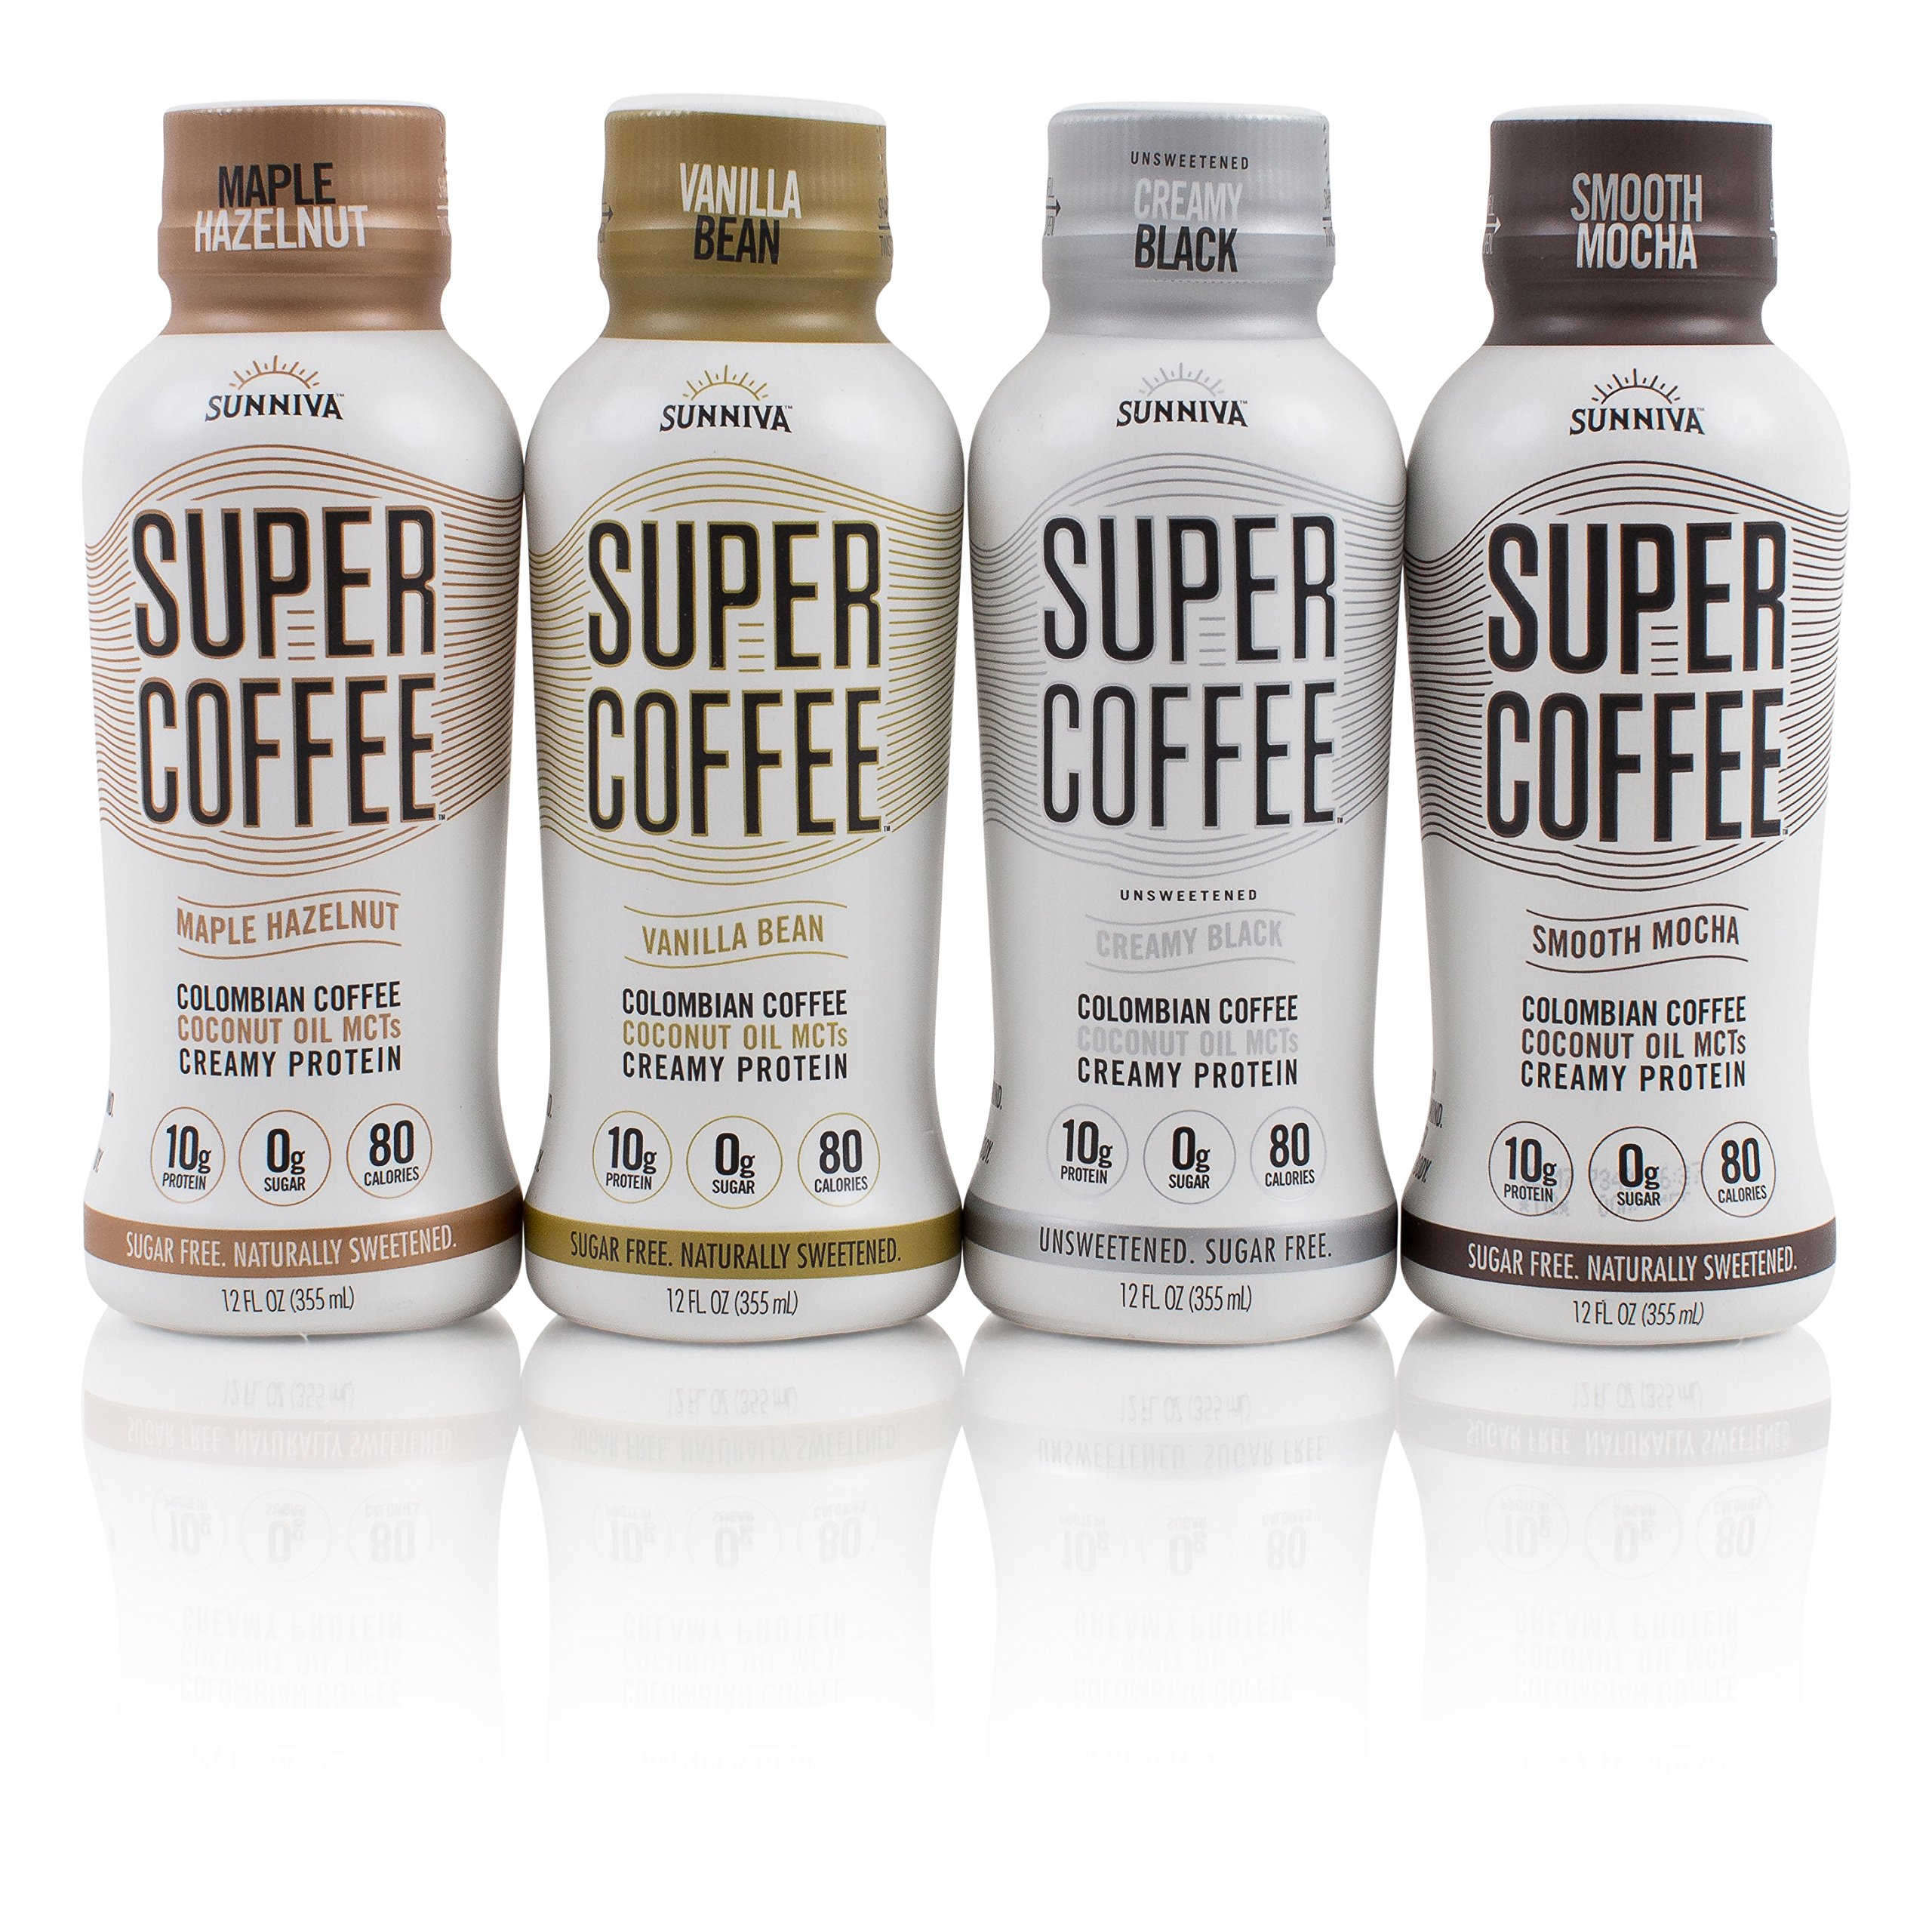 SUNNIVA Super Coffee 4 Variety Pack NEW Sugar-Free Formula, 10g Protein, Lactose Free, Soy Free, Gluten Free (1 each of Vanilla Bean, Smooth Mocha, Maple Hazelnut, and Creamy Black)